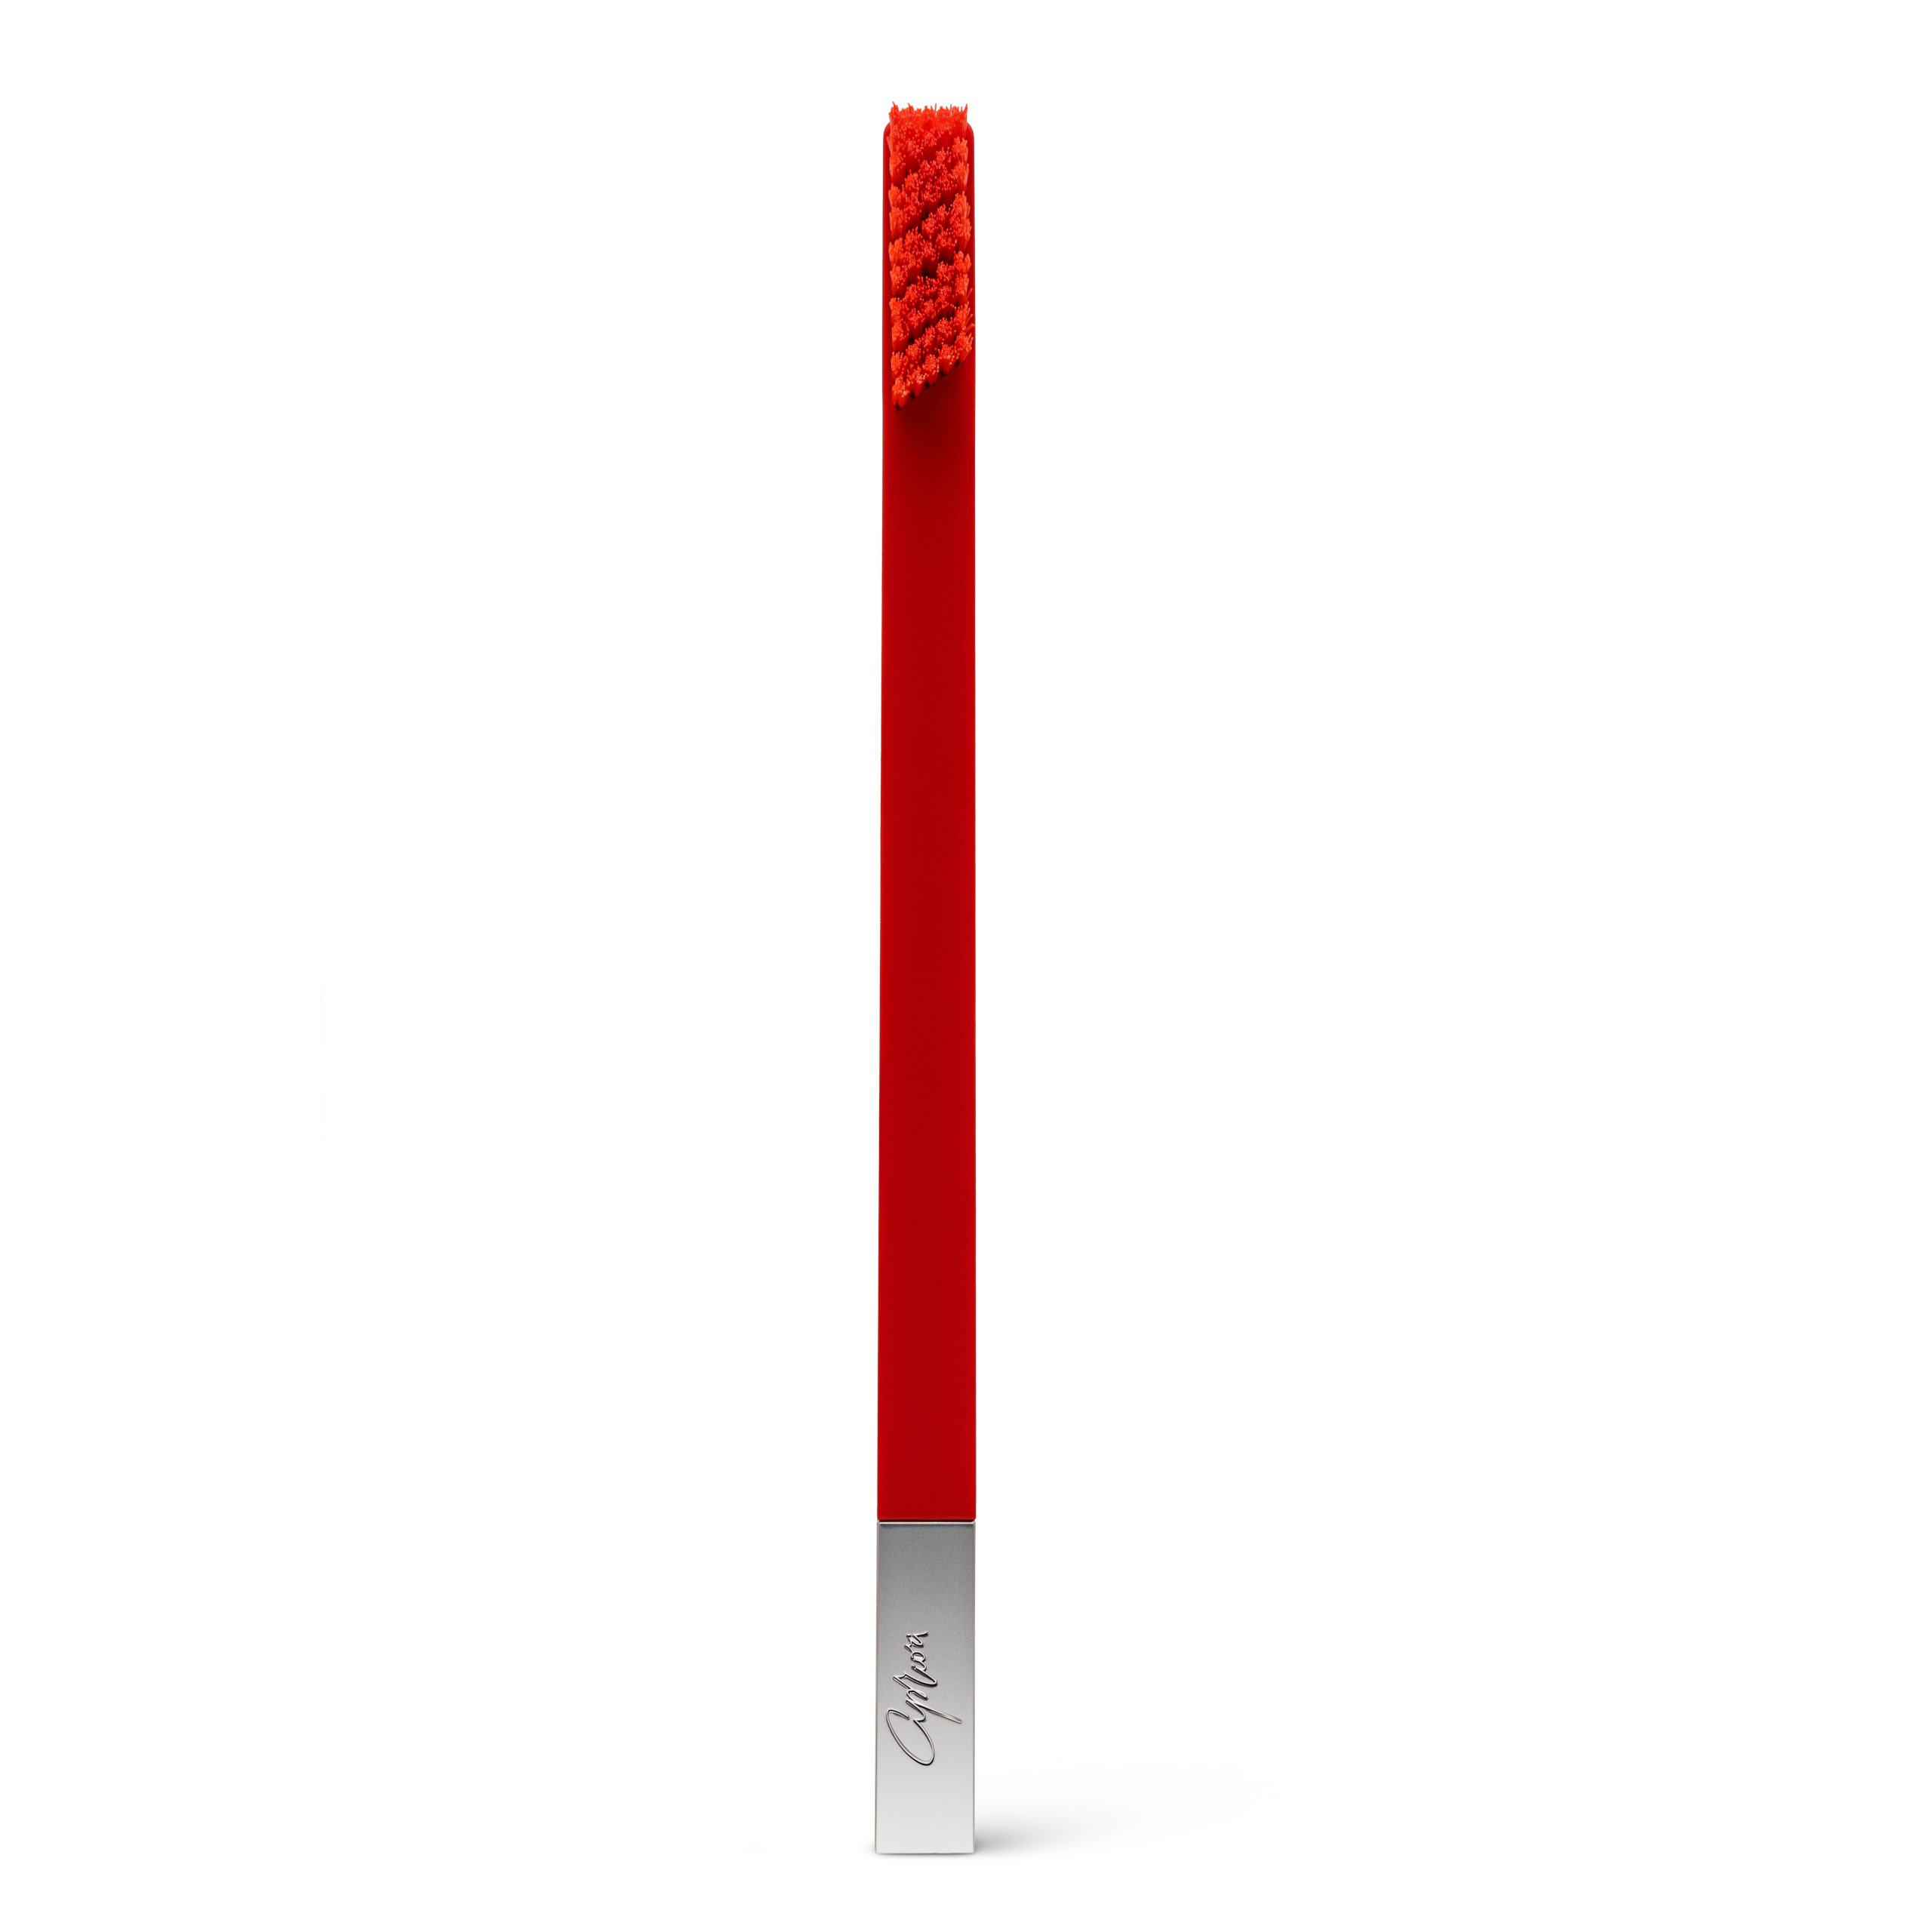 Carmine Red Silver designer toothbrush SLIM by Apriori